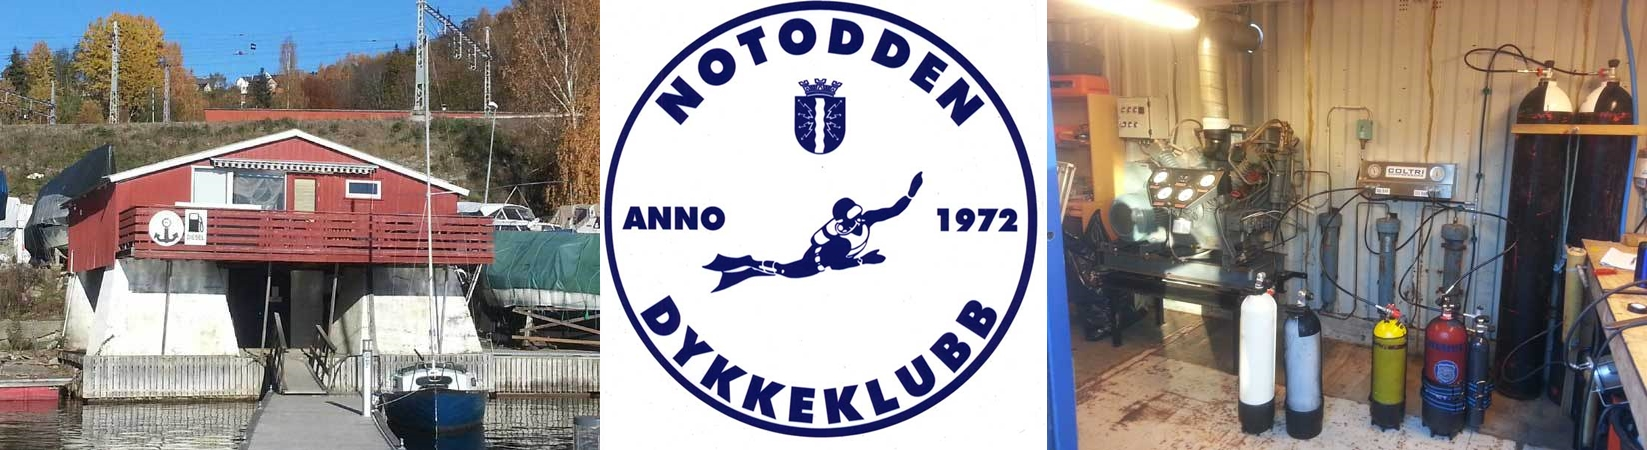 Notodden Dykkeklubb